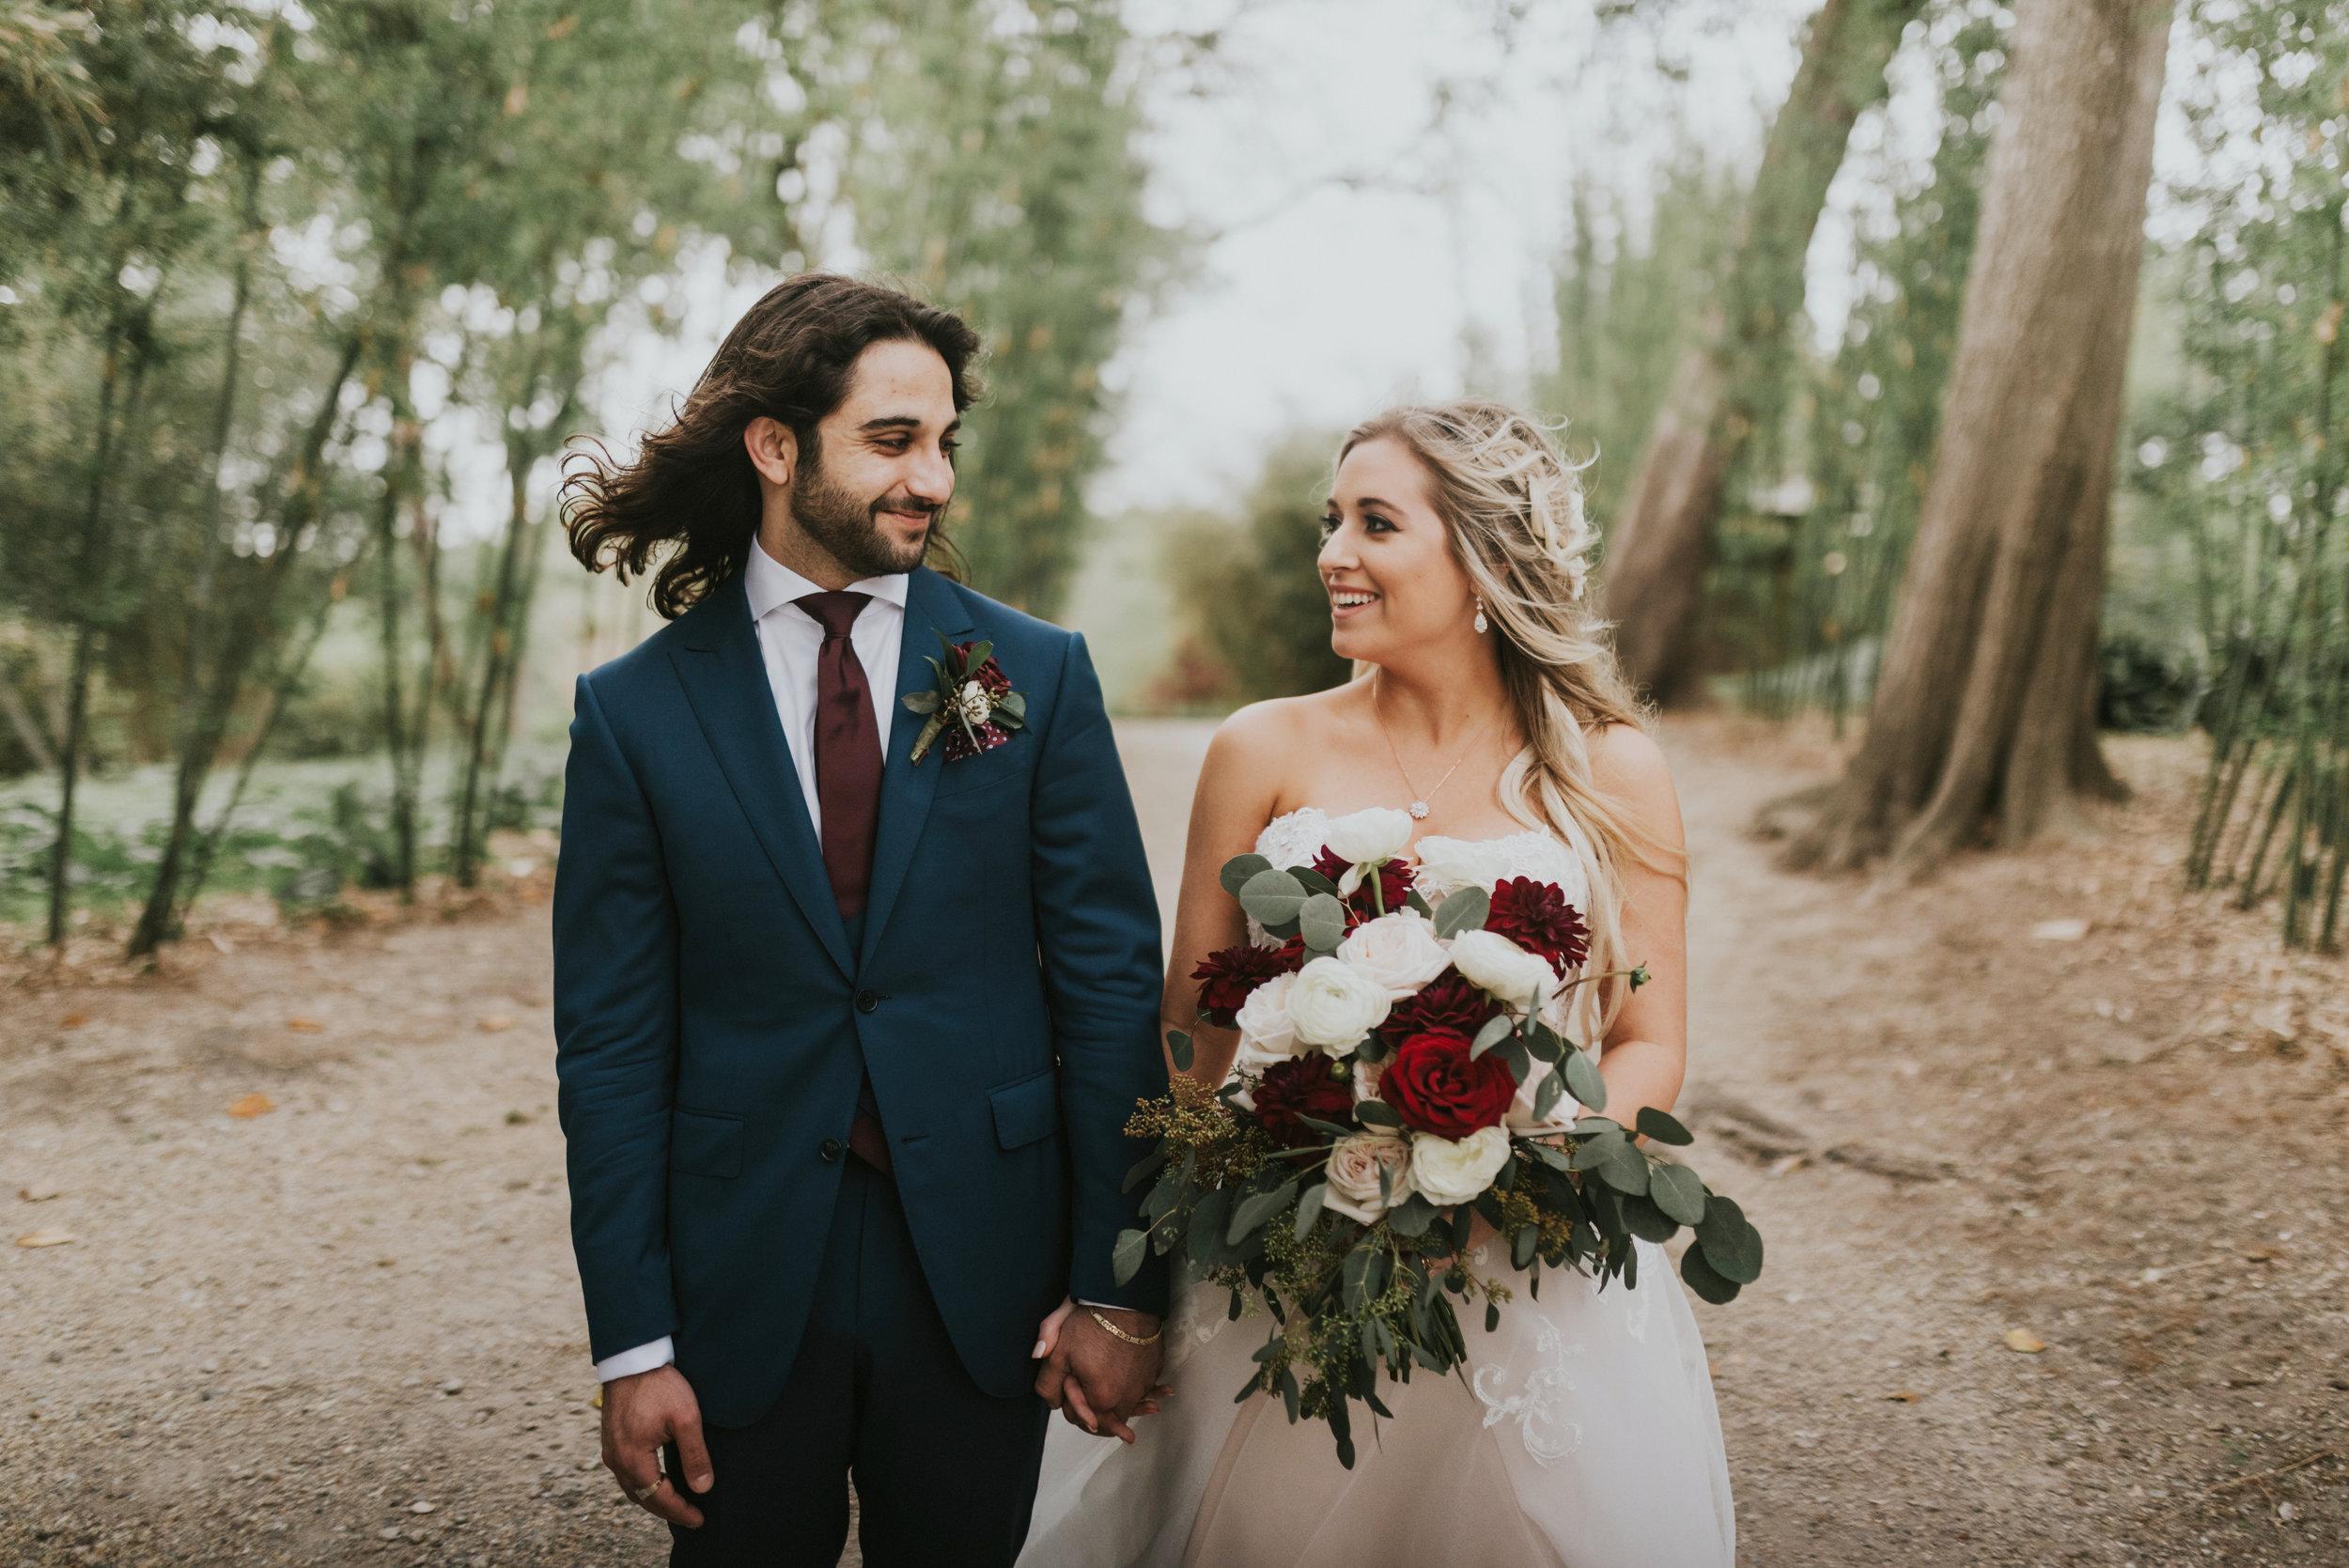 Southern Fete, Southern Wedding, Bride and Groom, Jen Menard Photo, Rip Van Winkle Gardens